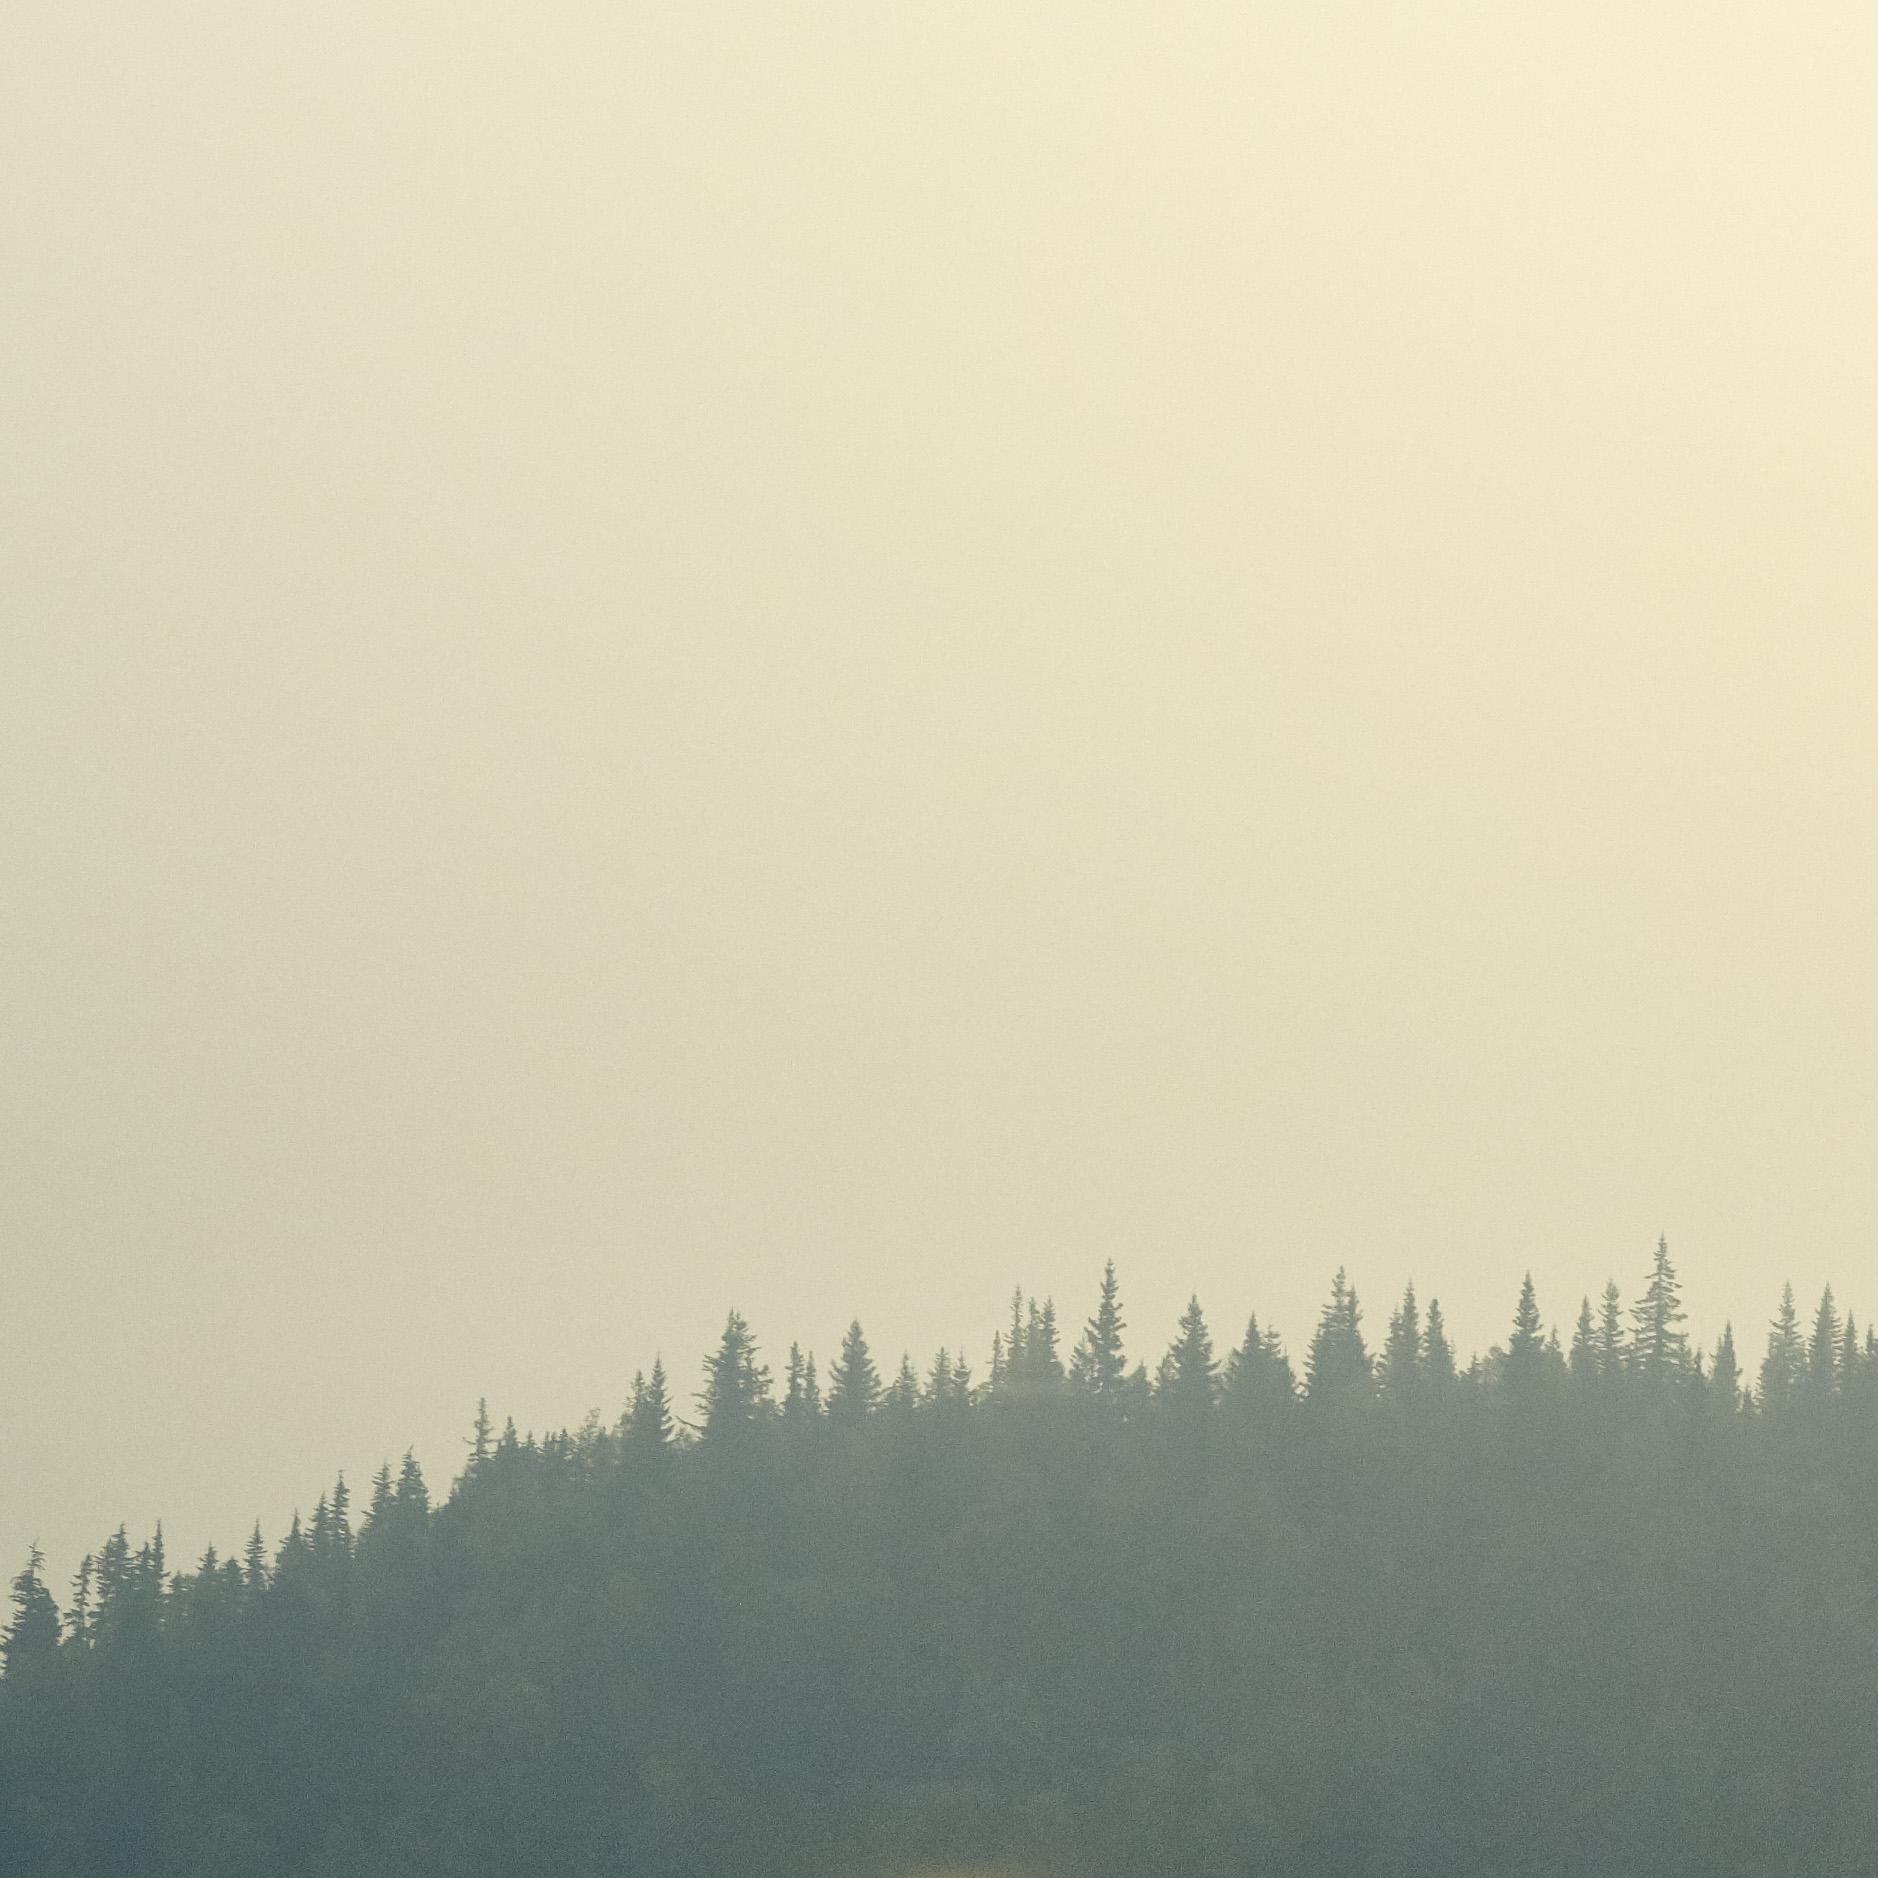 Alaska_001.jpg